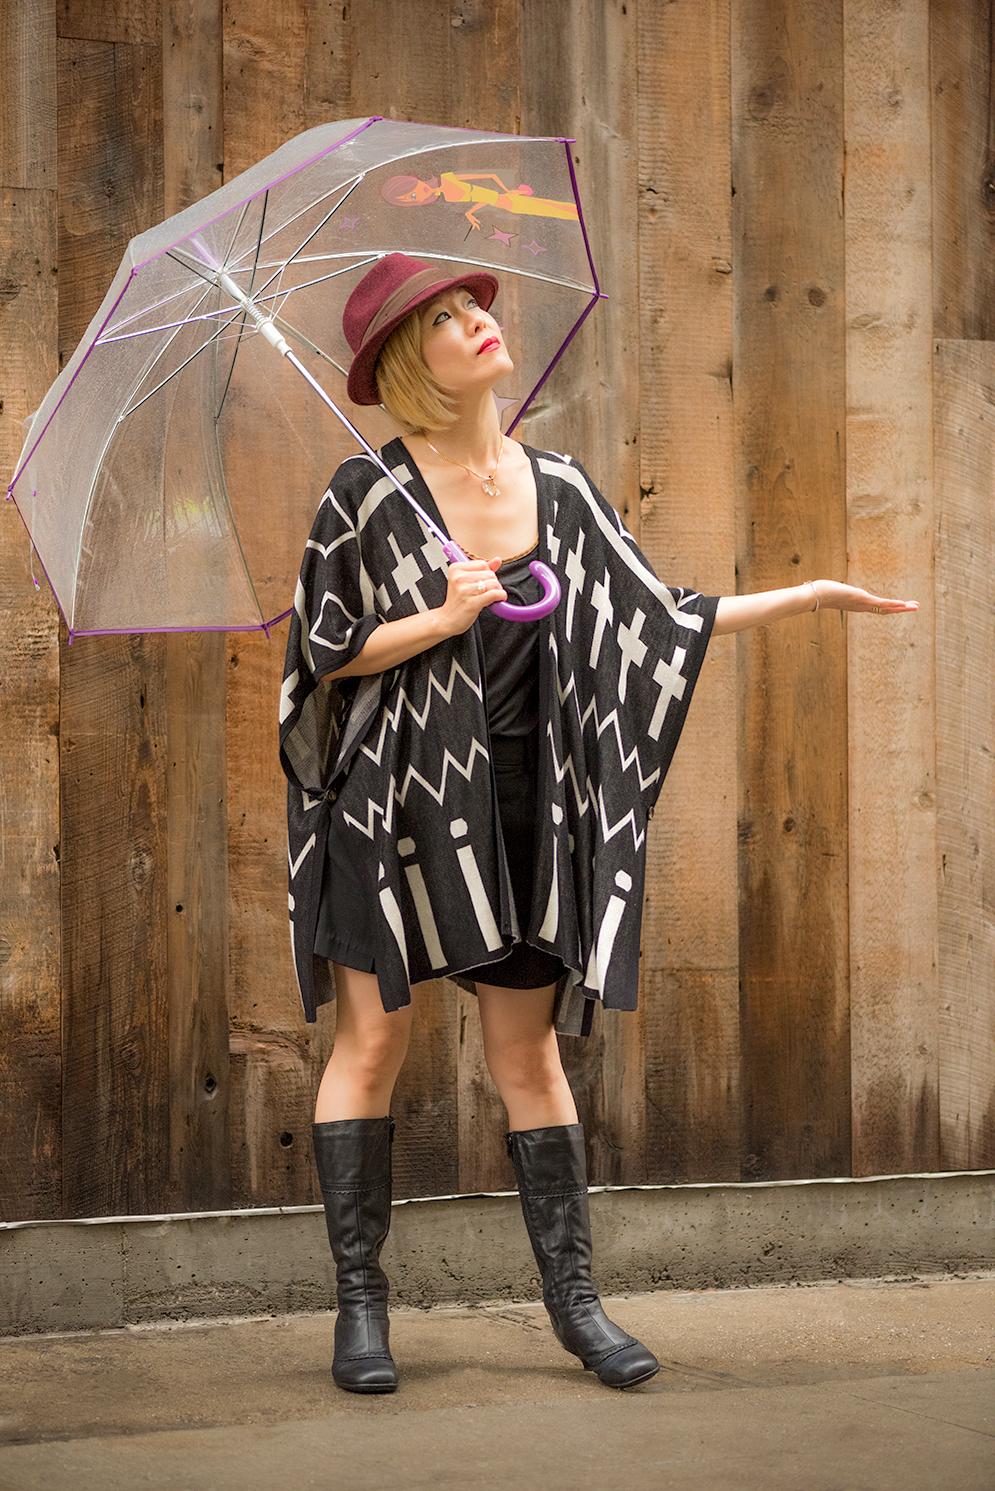 ROCK MAMA NYC LIFESTYLE BLOG - RAIN RAIN GO AWAY...ACTUALLY IT'S OK